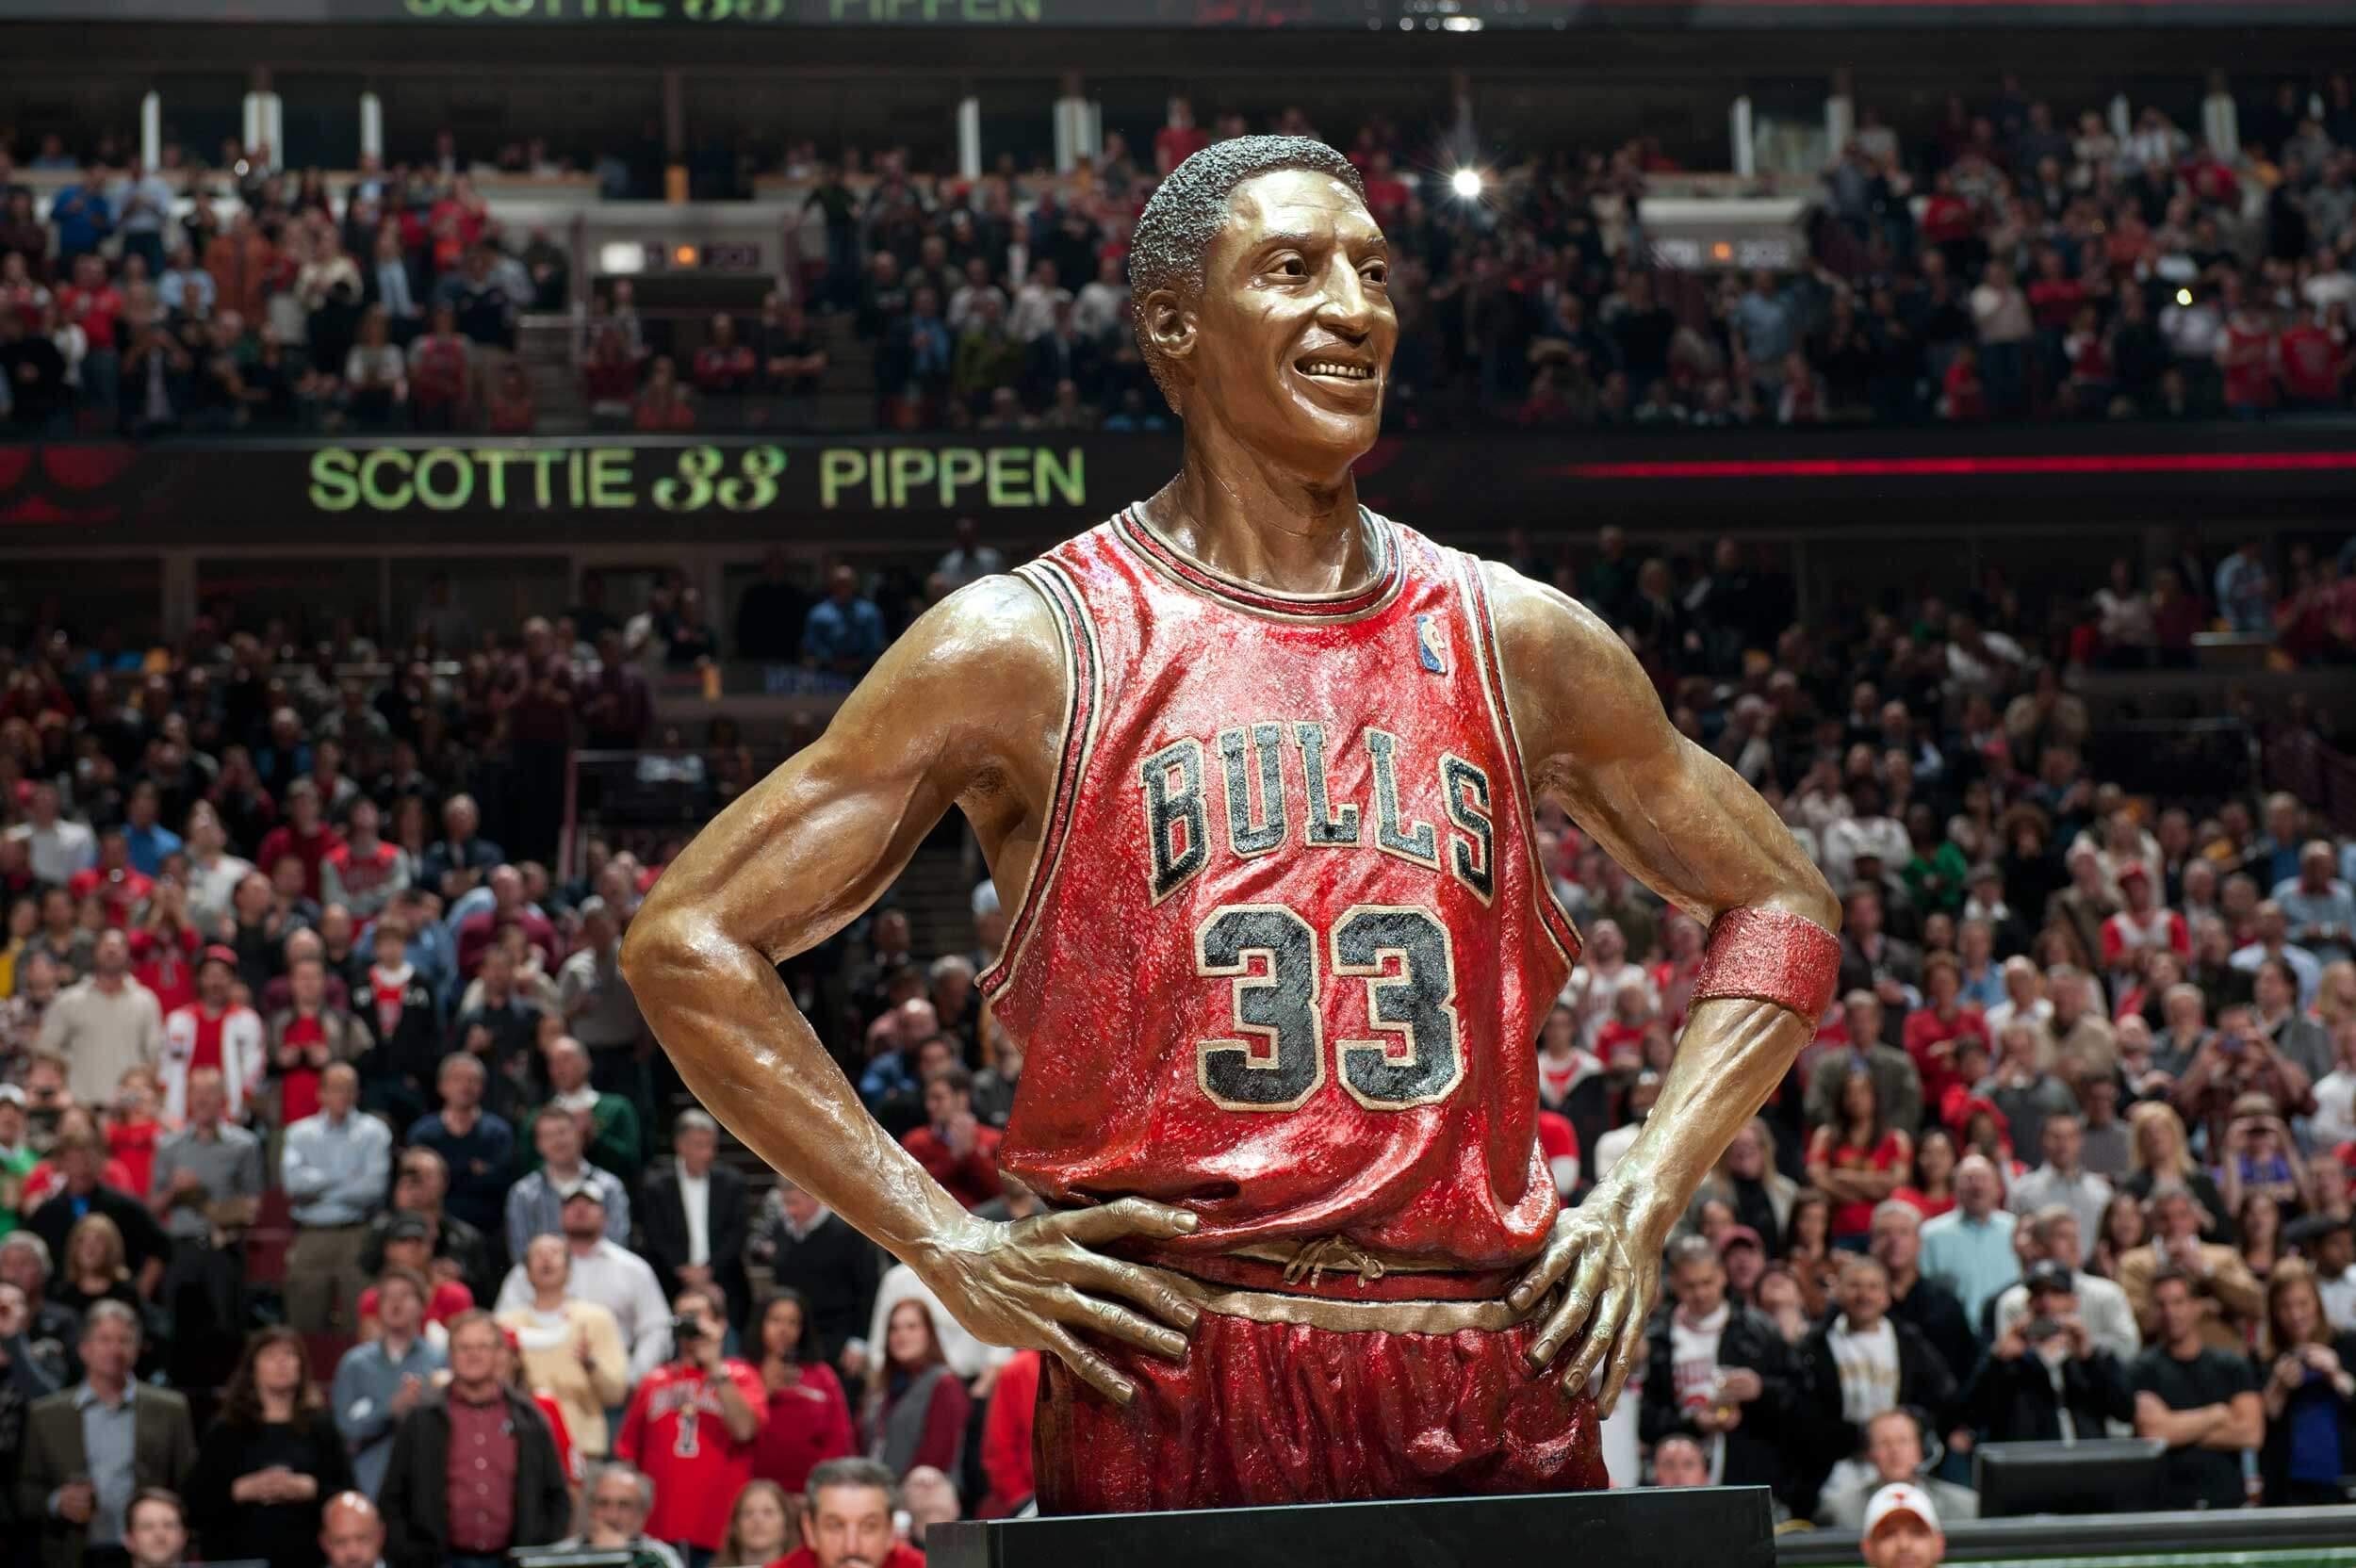 Scottie Pippen, Chicago Bulls, NBA, statue